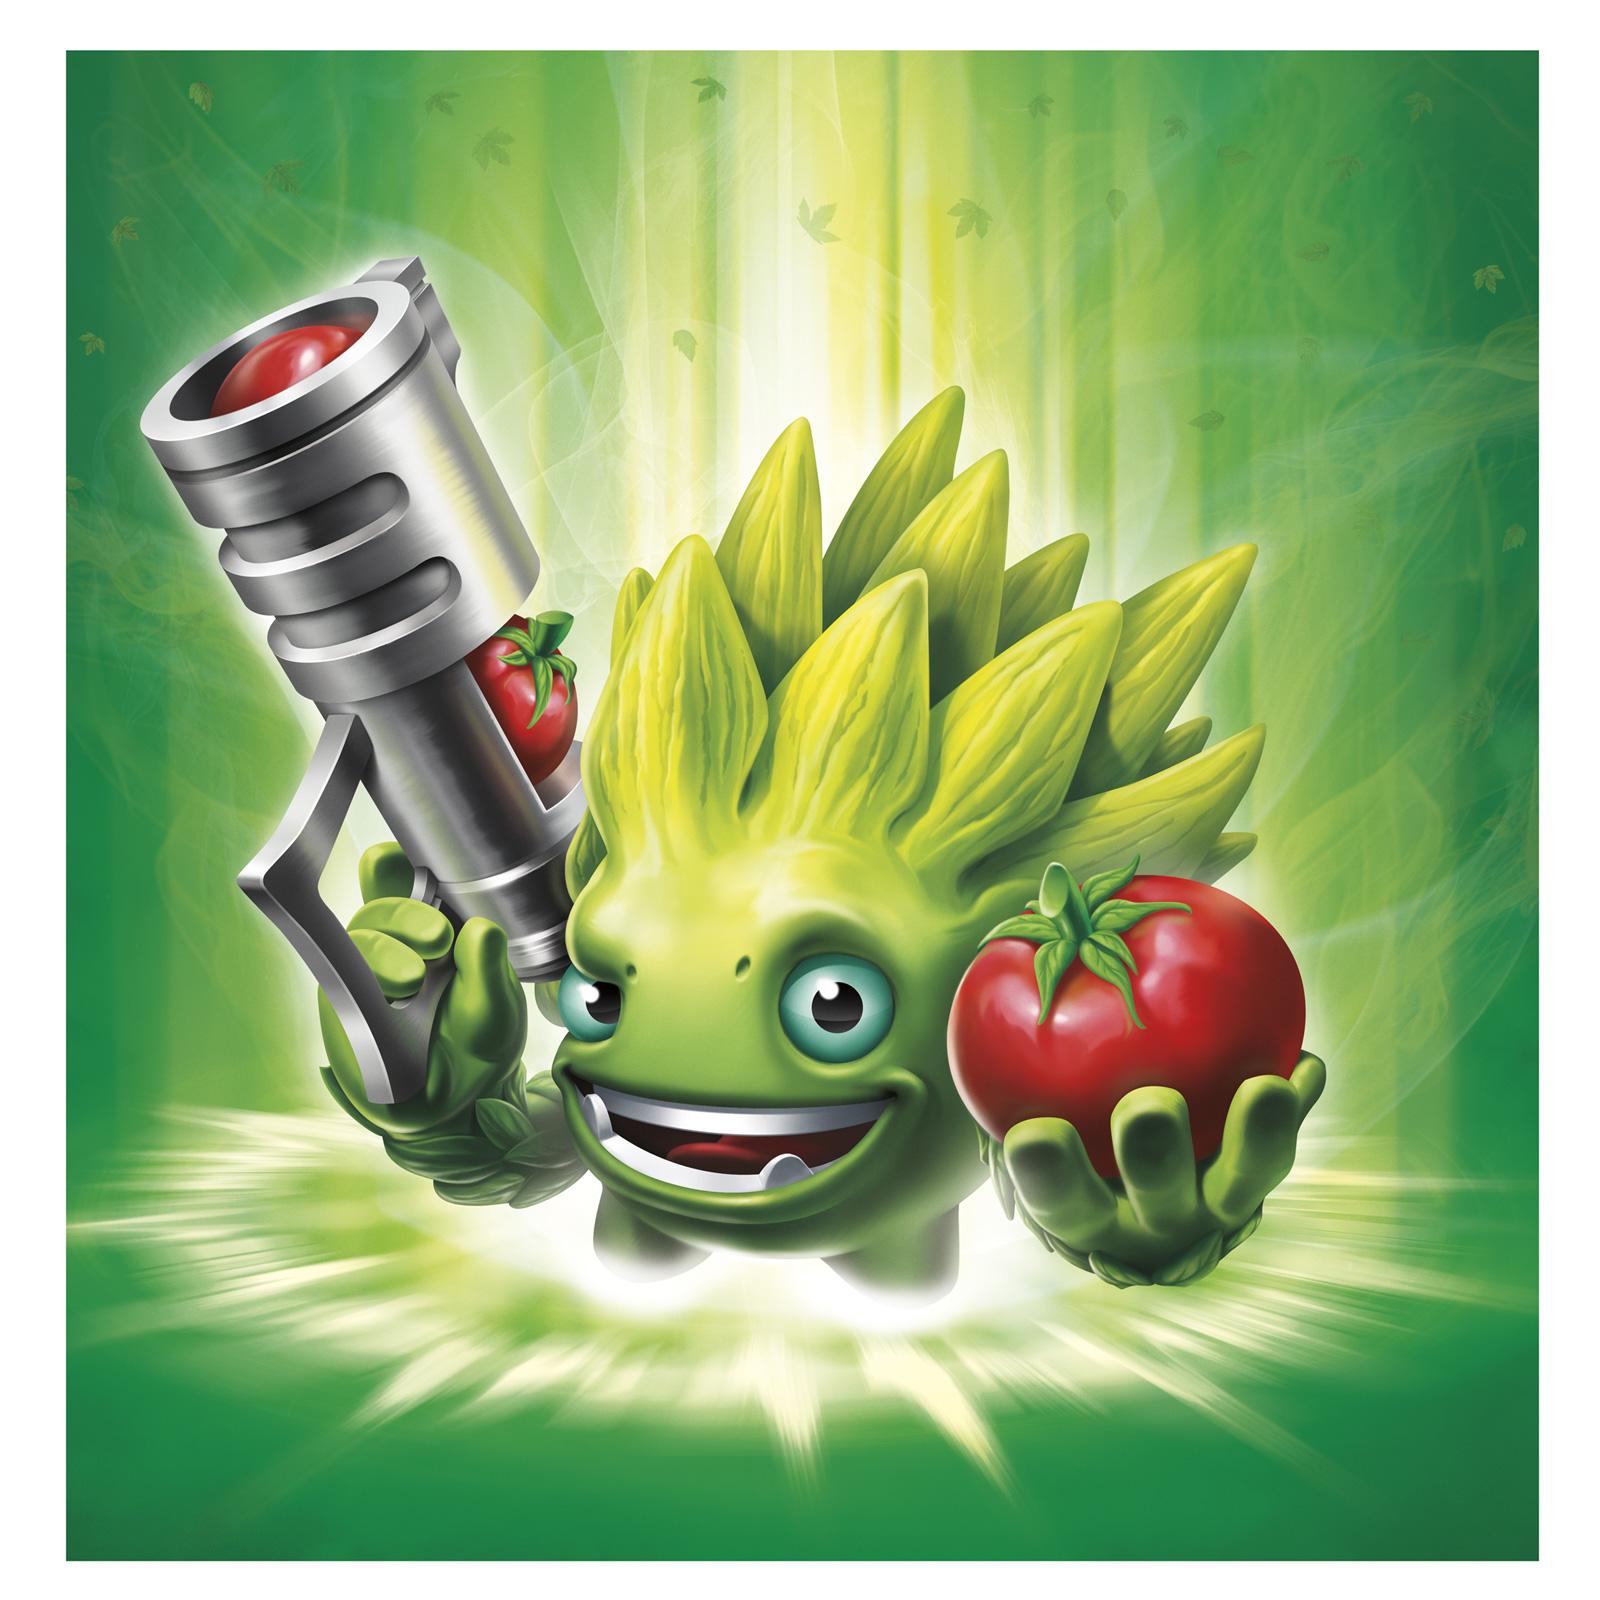 Stt_ilus_foodfight_final_crop_hires